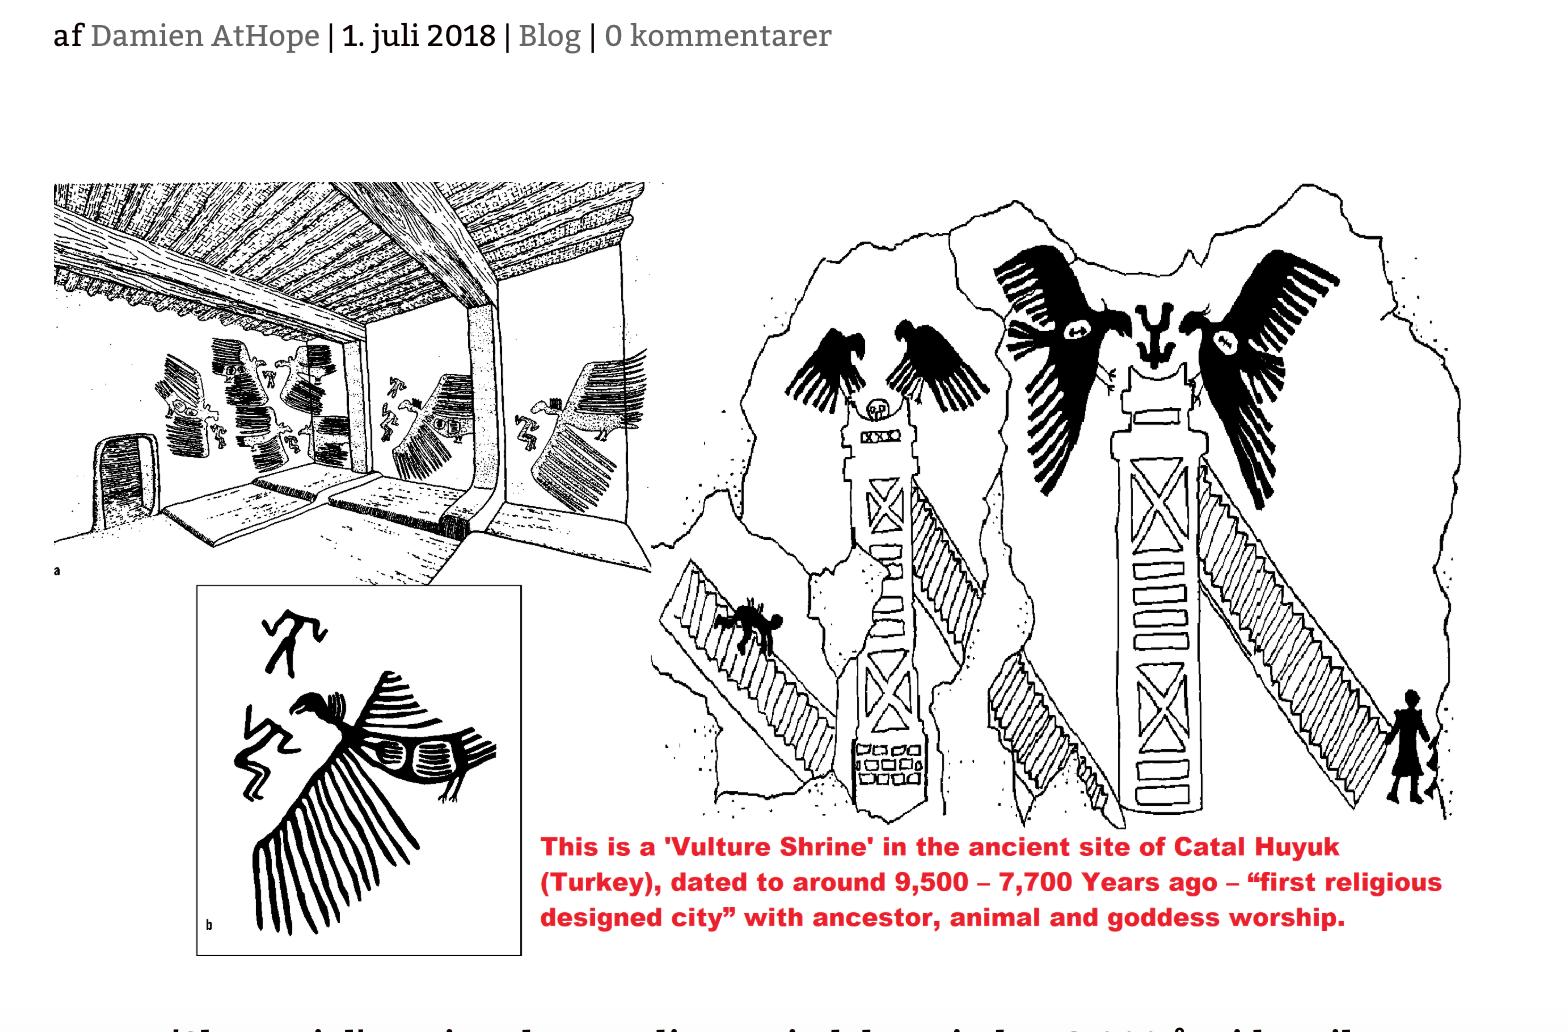 Skærmbillede 2018-09-21 kl. 19.10.14Alevi yol cem erkanı reformu Alevilik aleviler Devrimci Aleviler birliği DAB Pir sultan bektaşi.avi